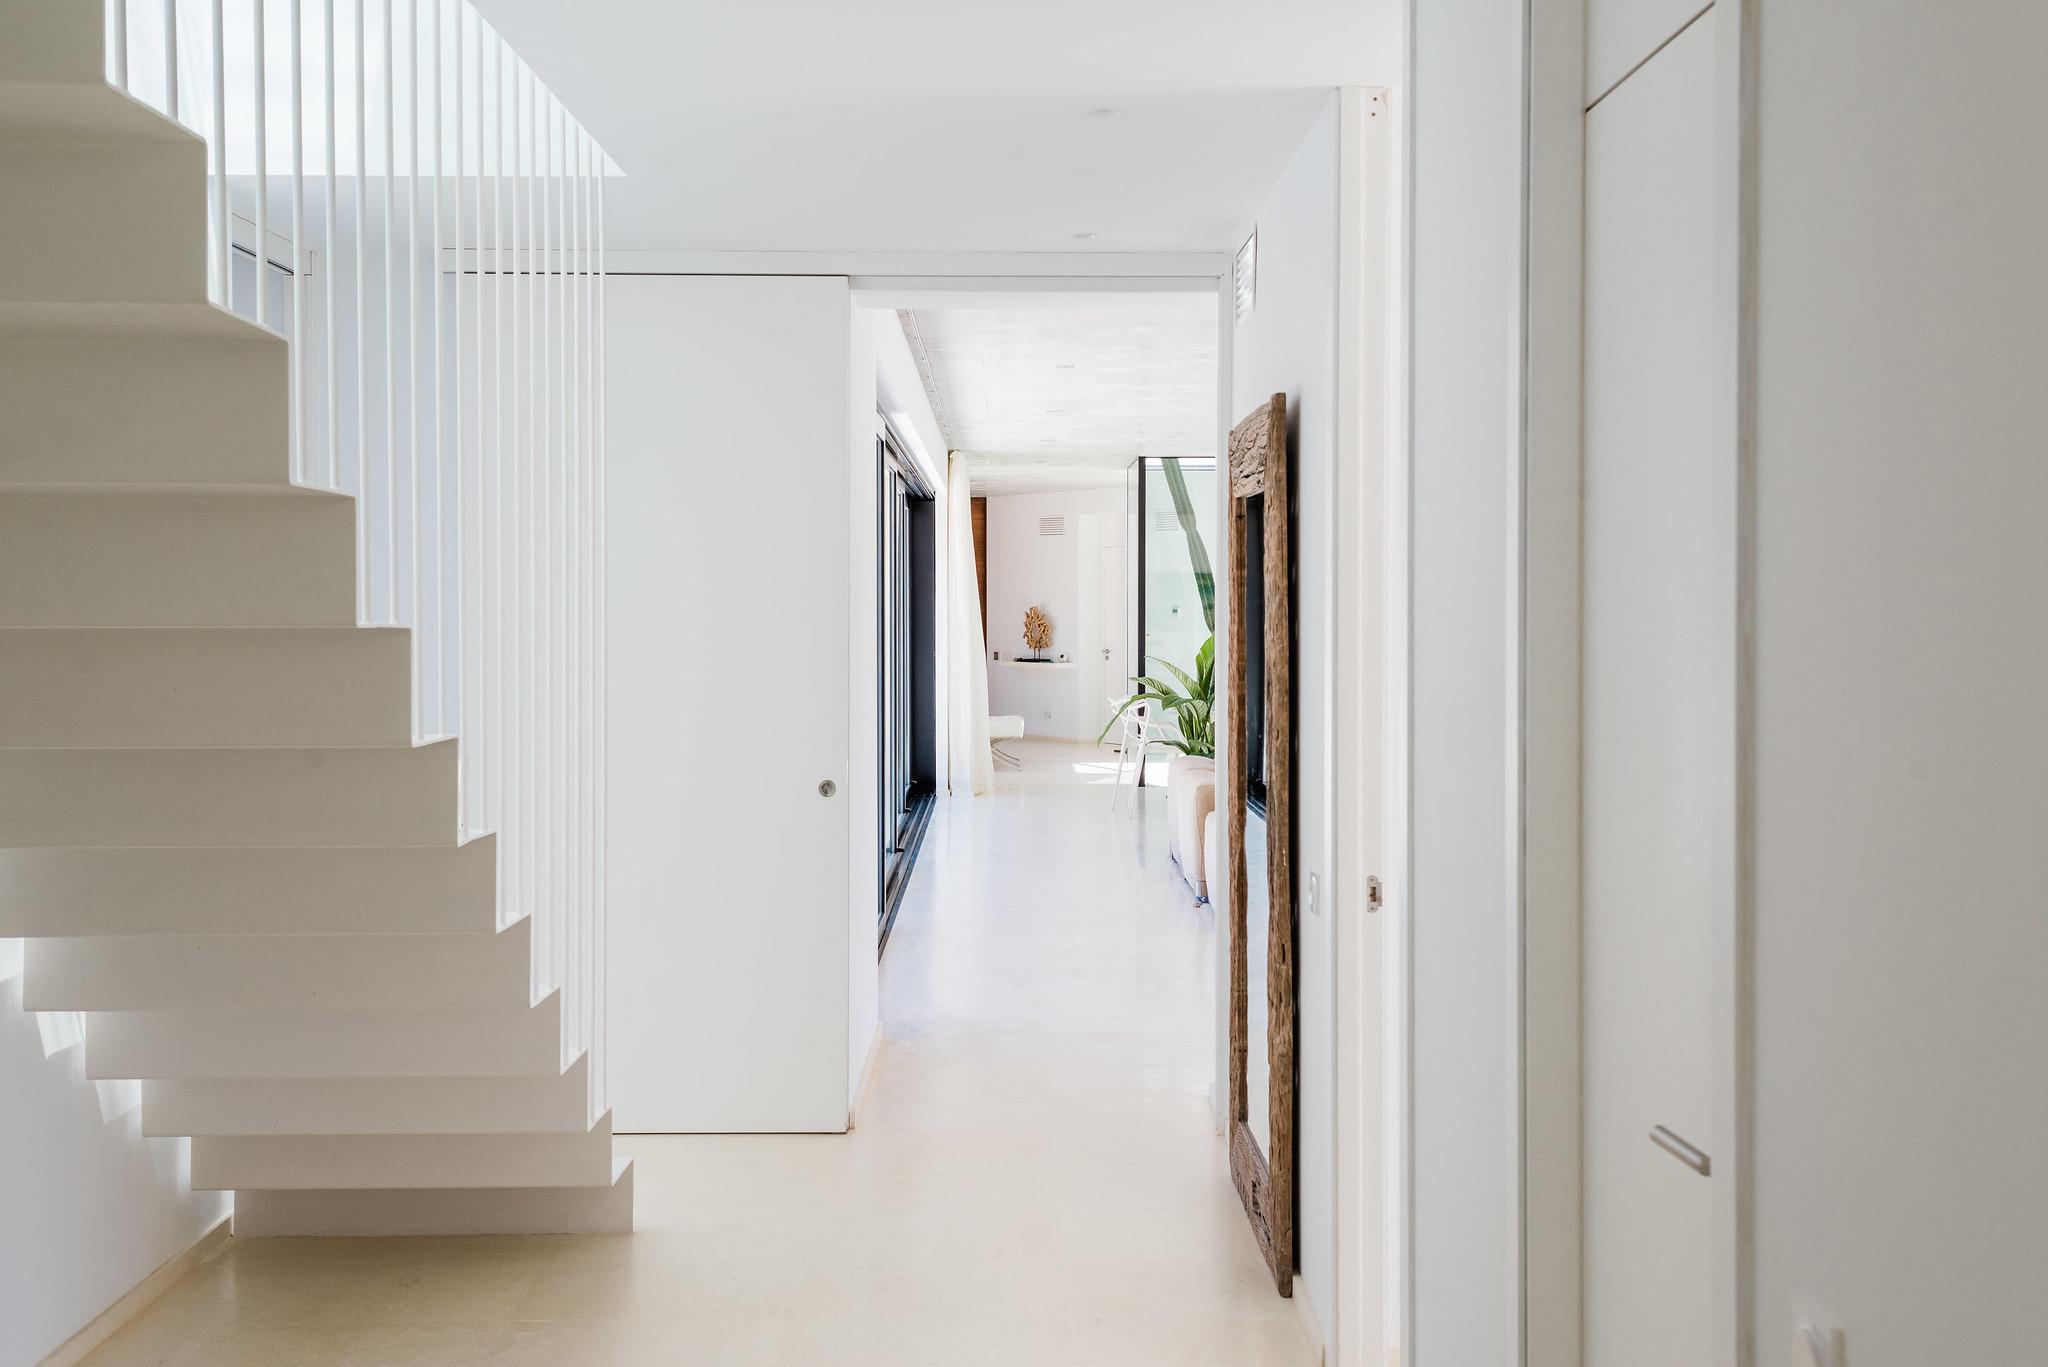 https://www.white-ibiza.com/wp-content/uploads/2020/06/white-ibiza-villas-can-carmen-interior-hallway.jpg